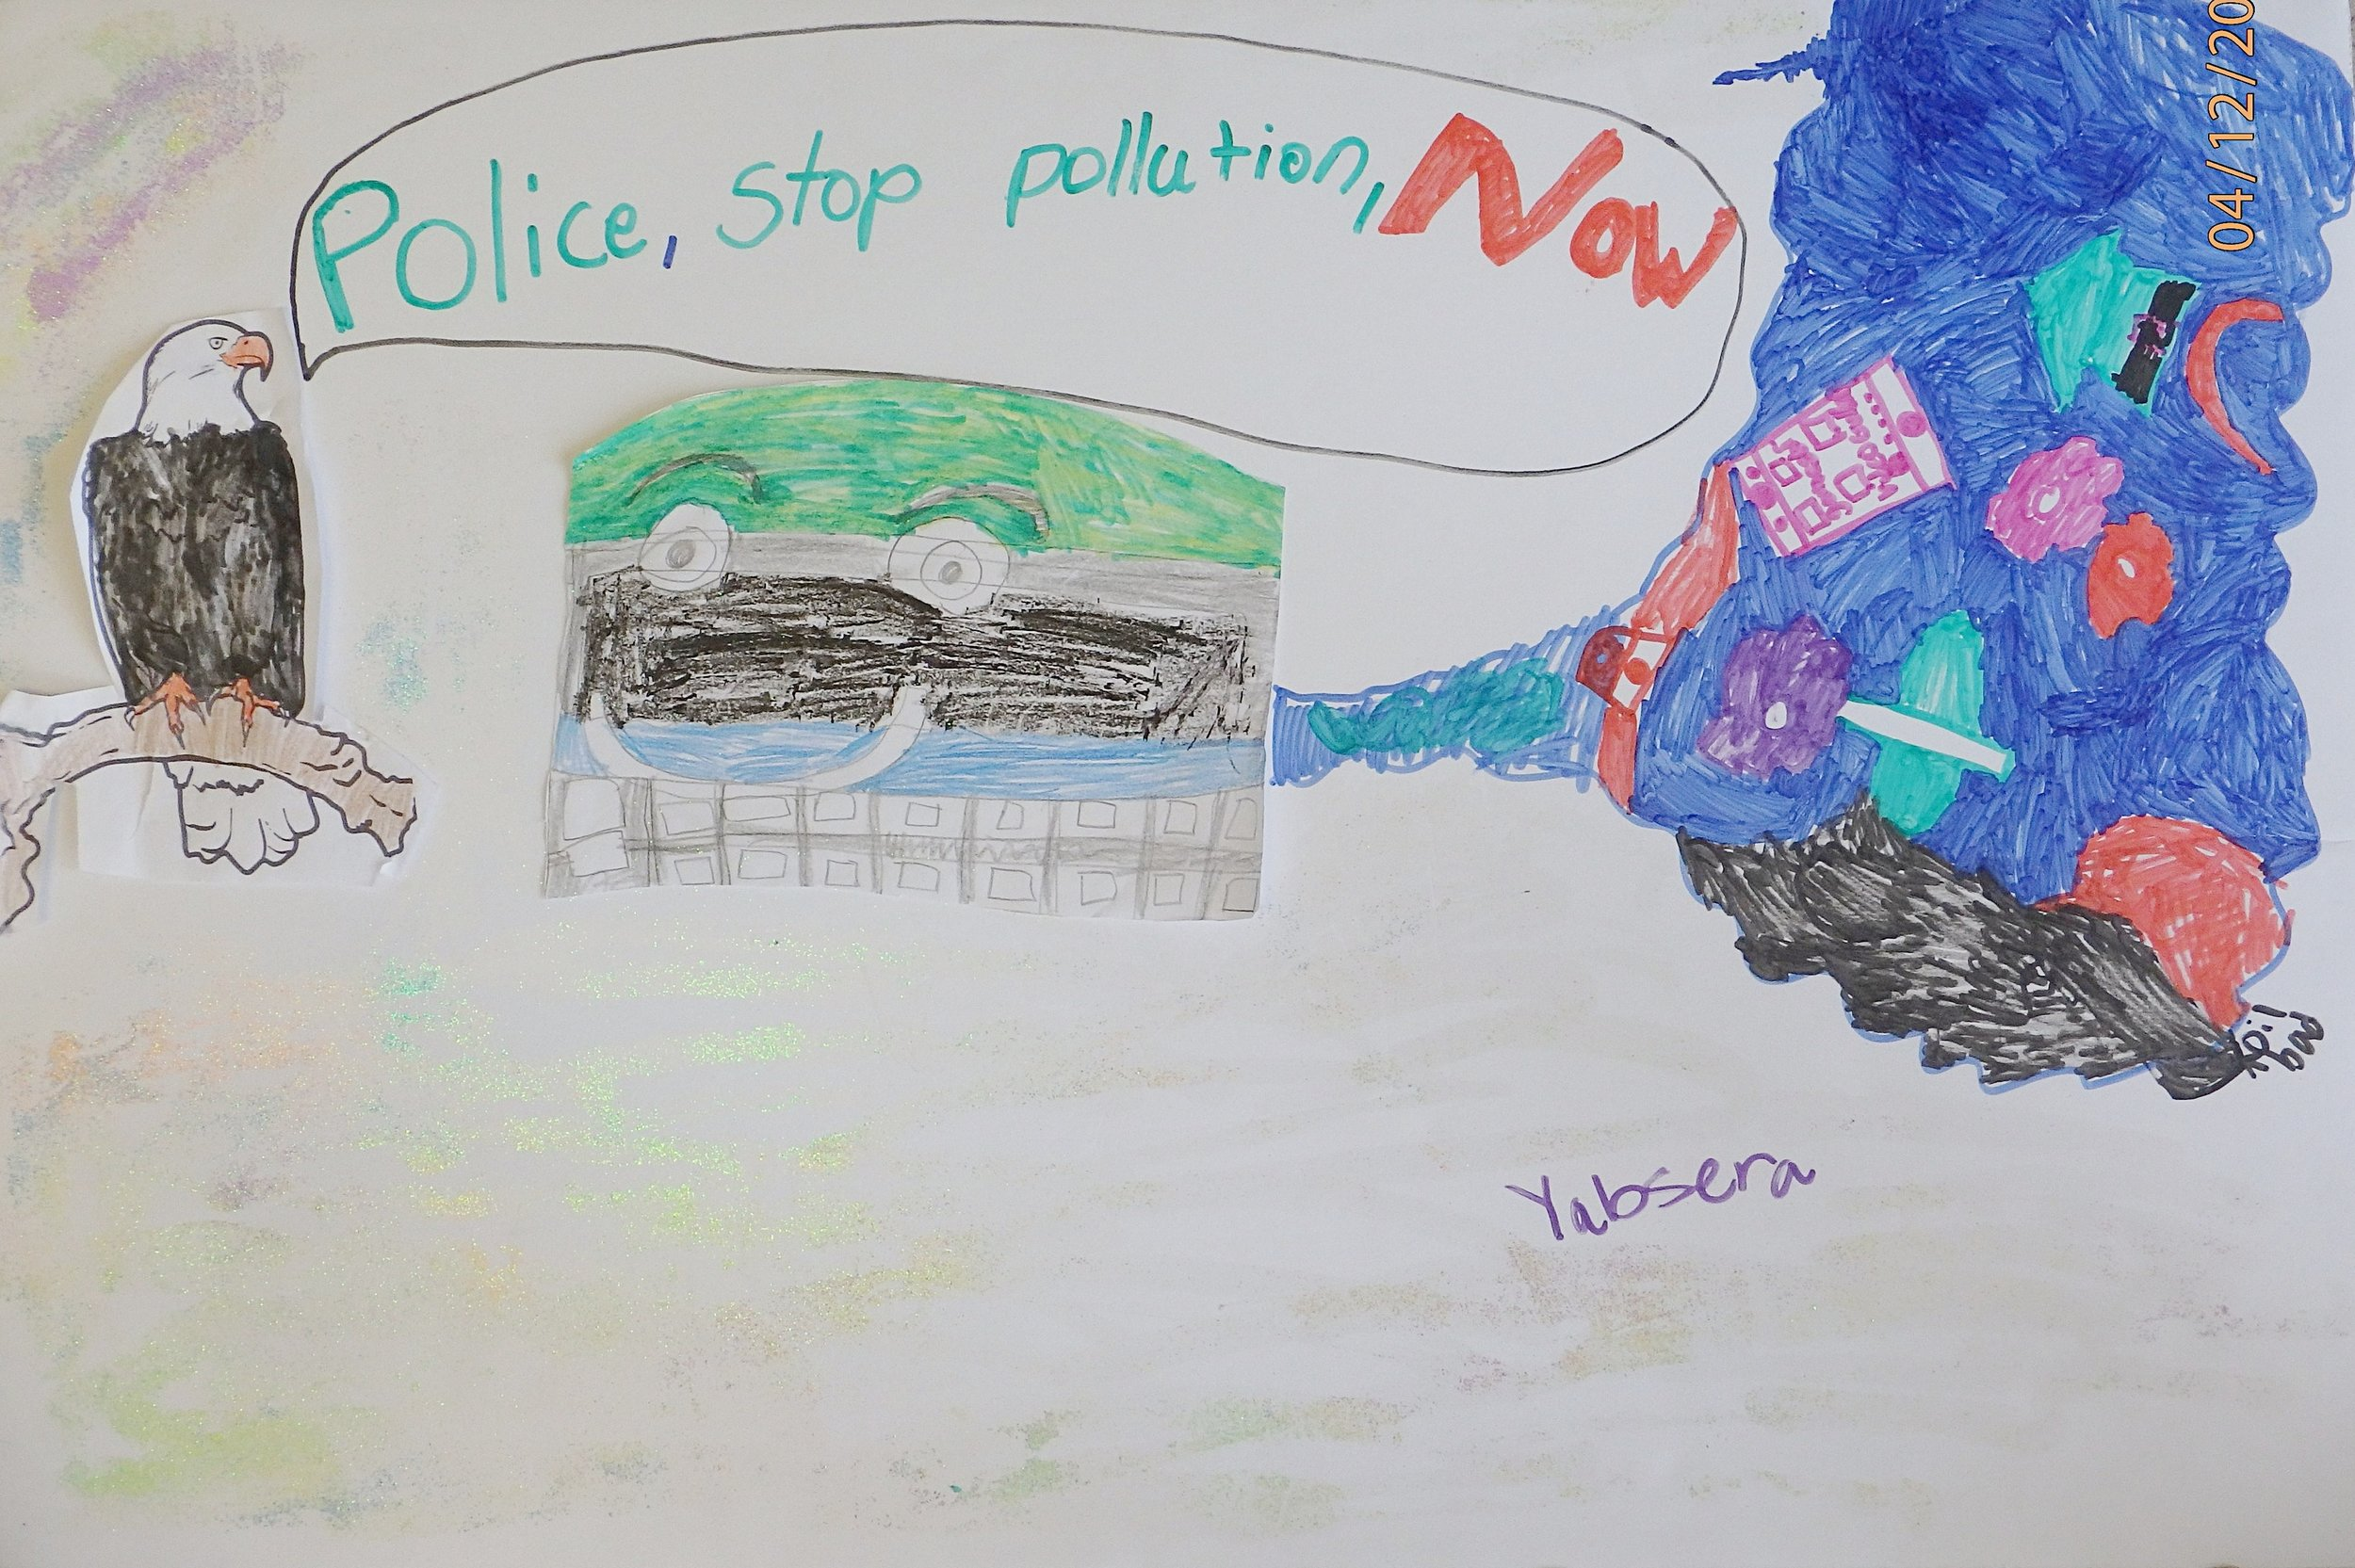 Yabsera Tsega, 3rd grader at Shady Grove Elementary